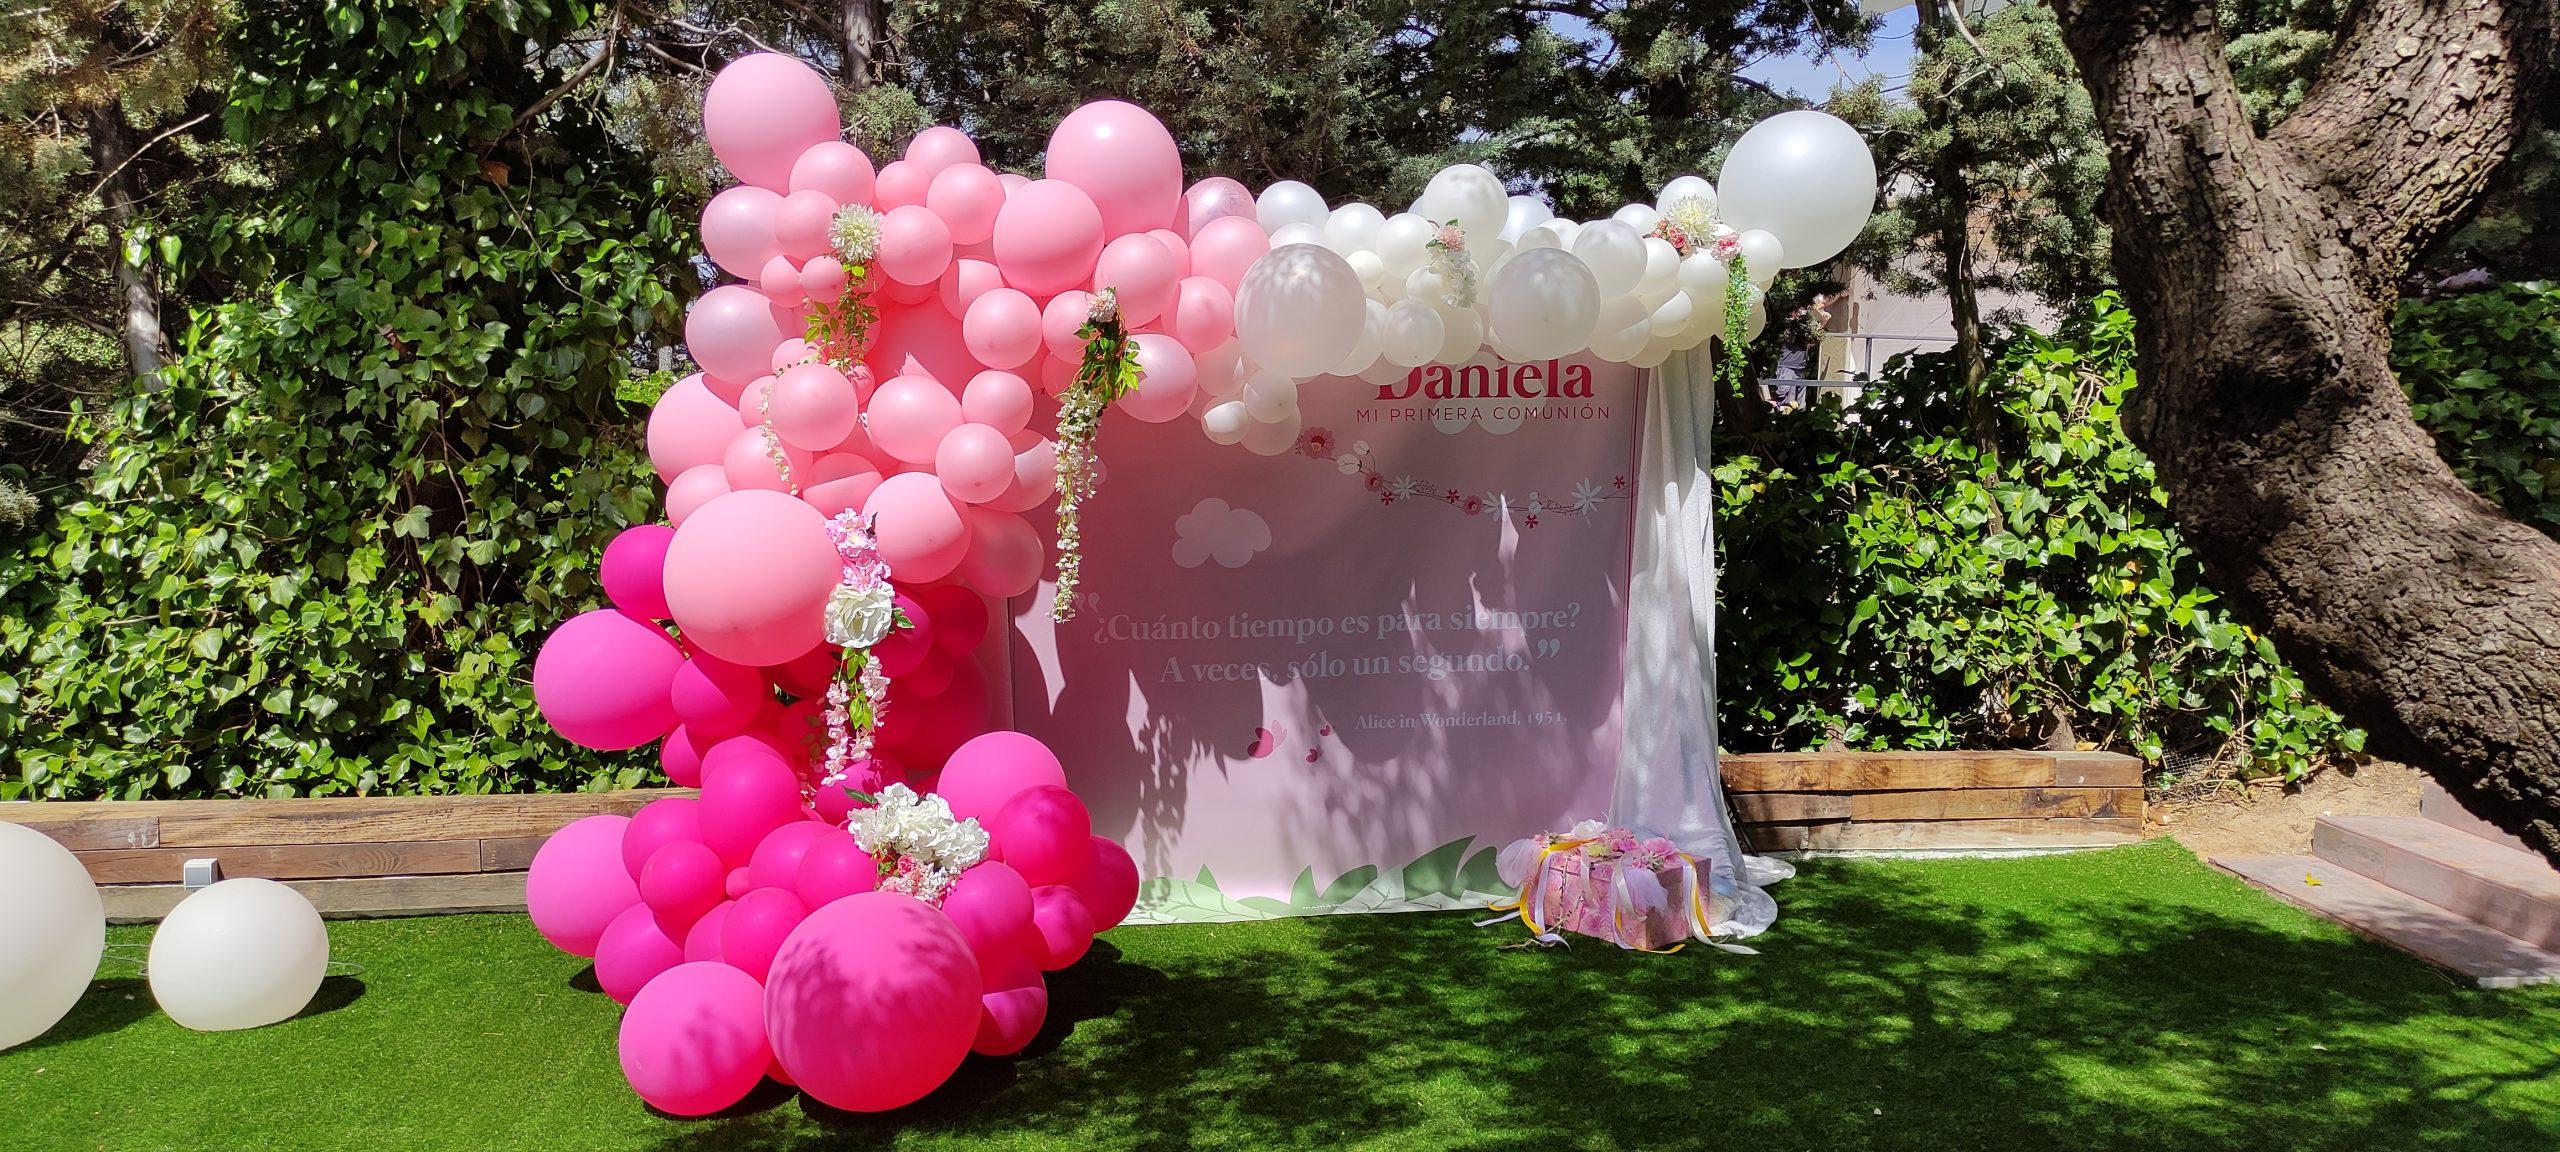 evento.love-weddingplanner-organizadoresdebodas-photocall-jardin